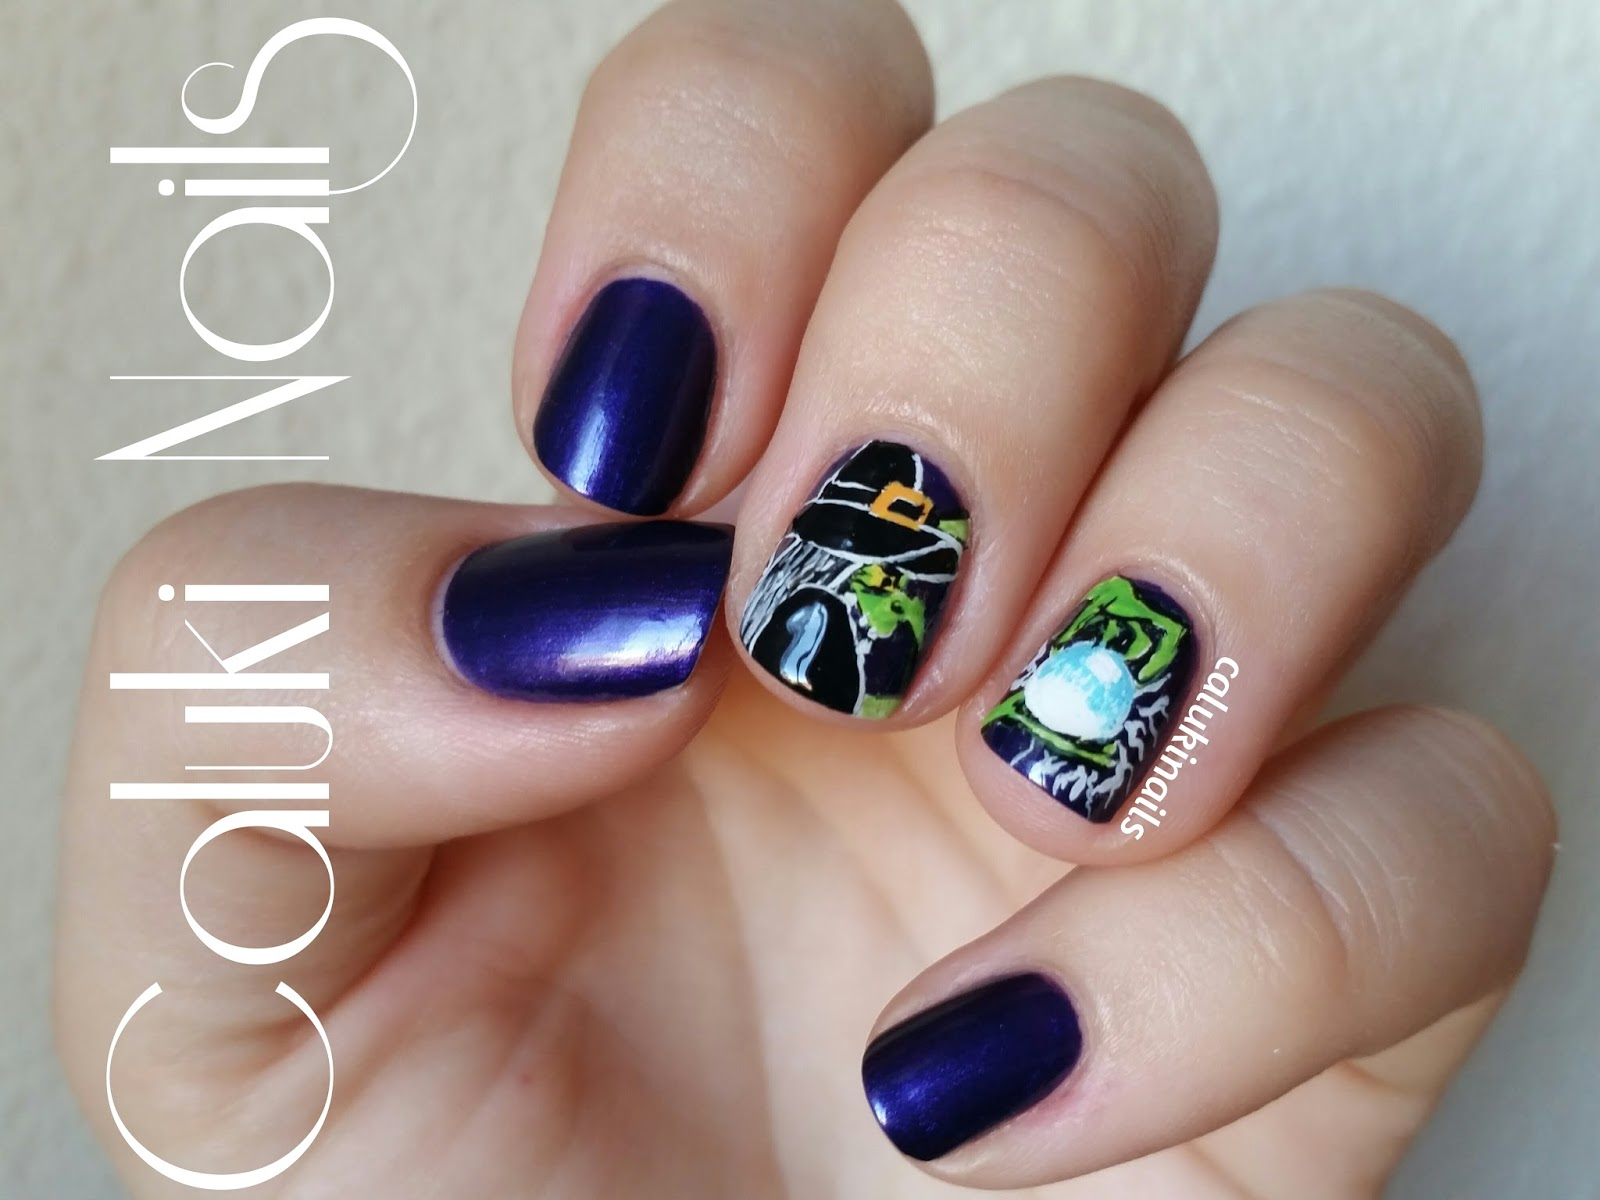 Caluki Nails Nail art Bruja RetoColoresCosasdeChicasVol3